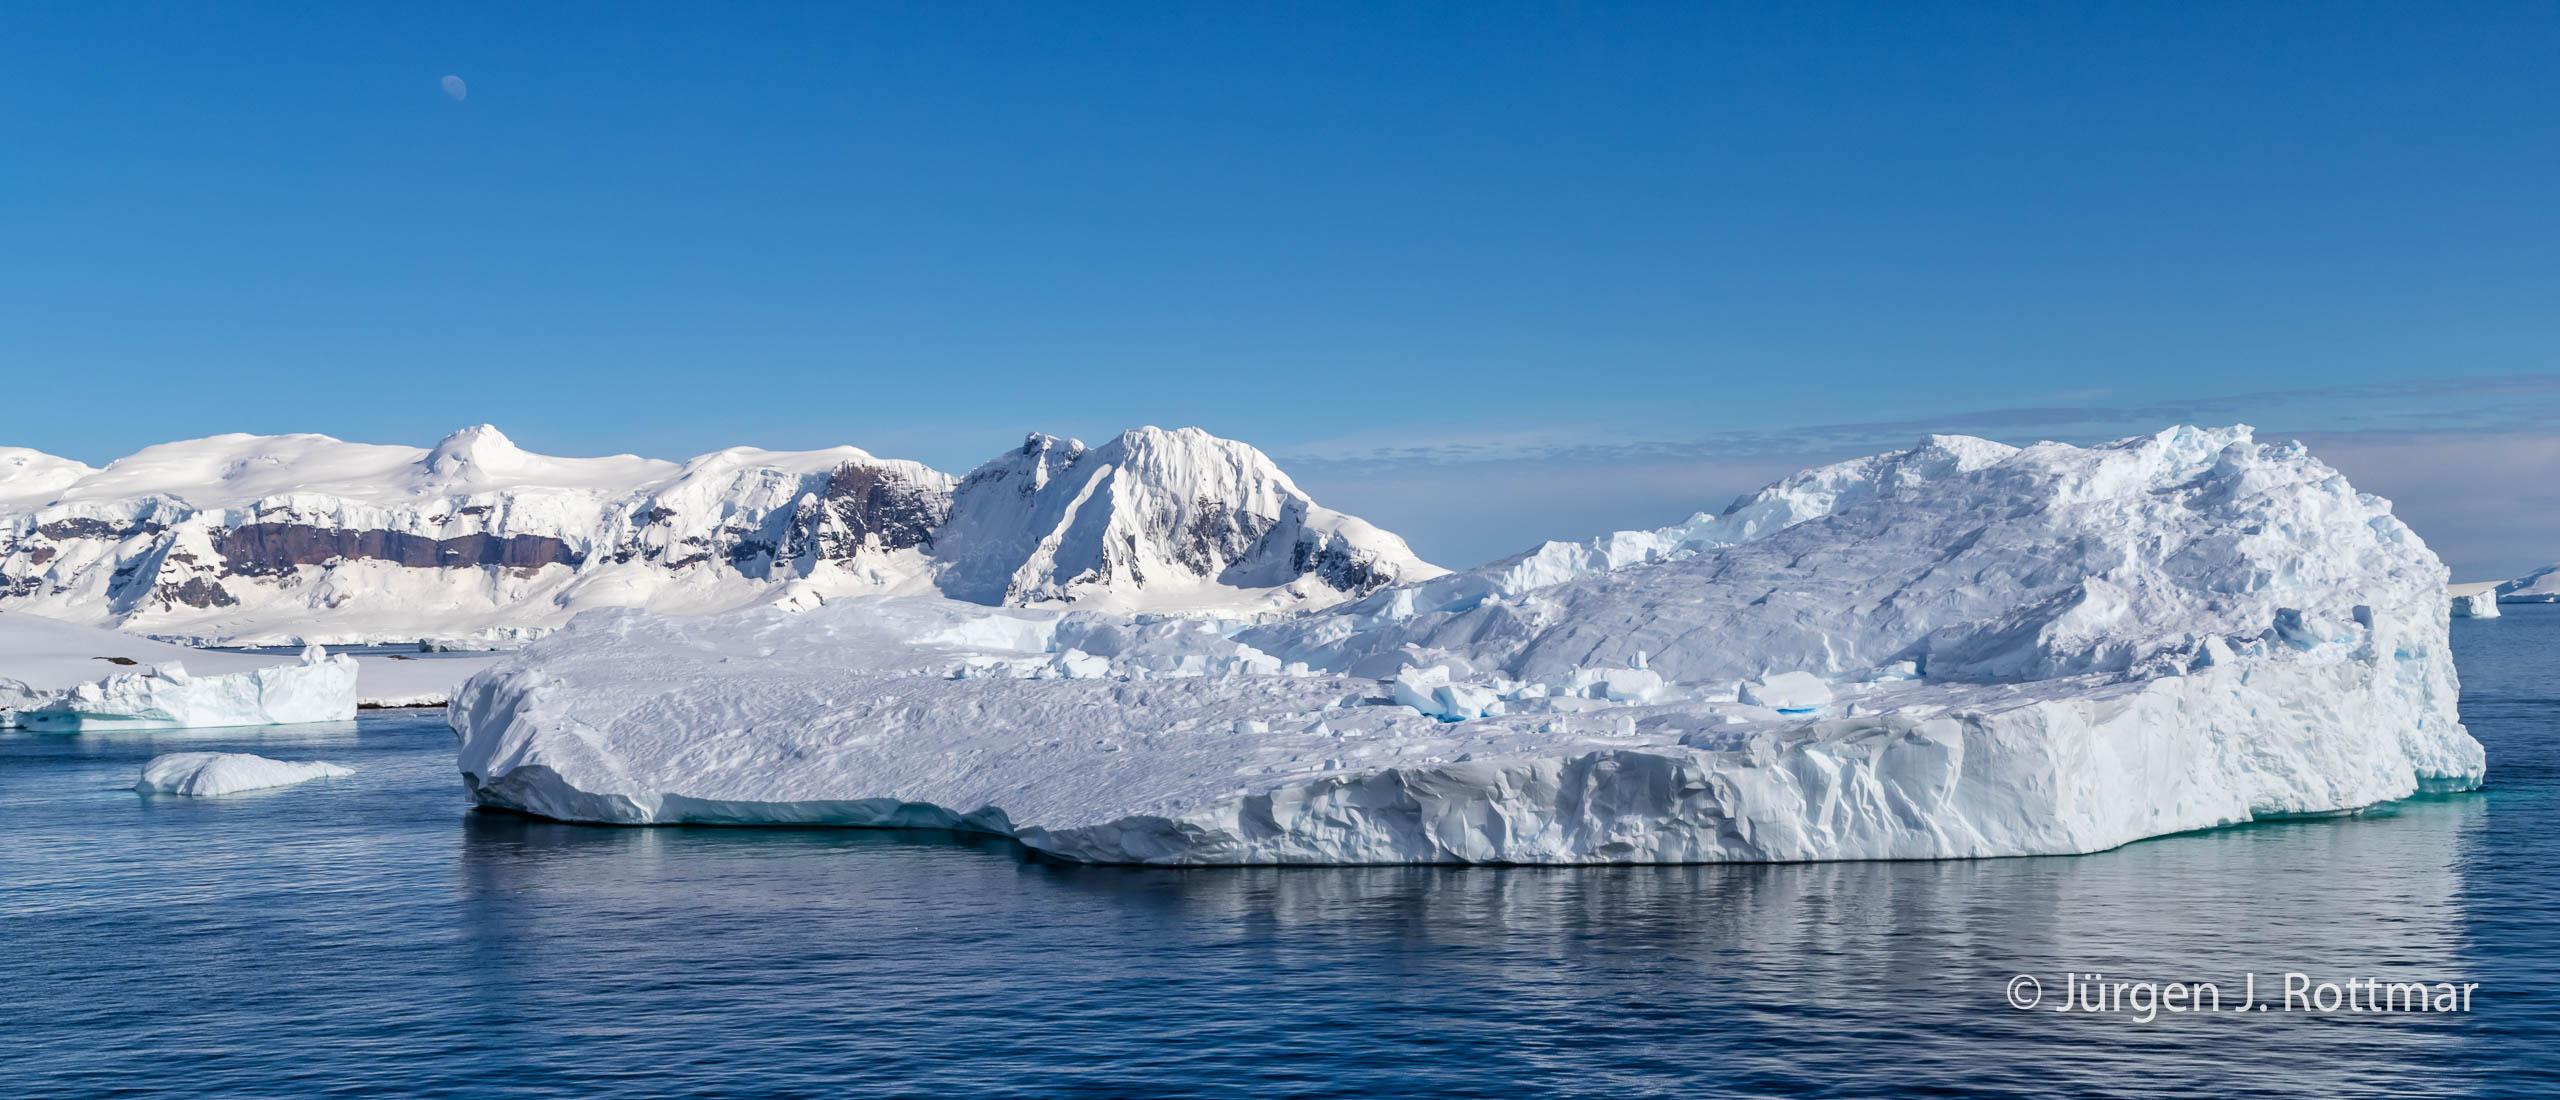 Juergen J Rottmar Antarctica M2I1136 Bearbeitet